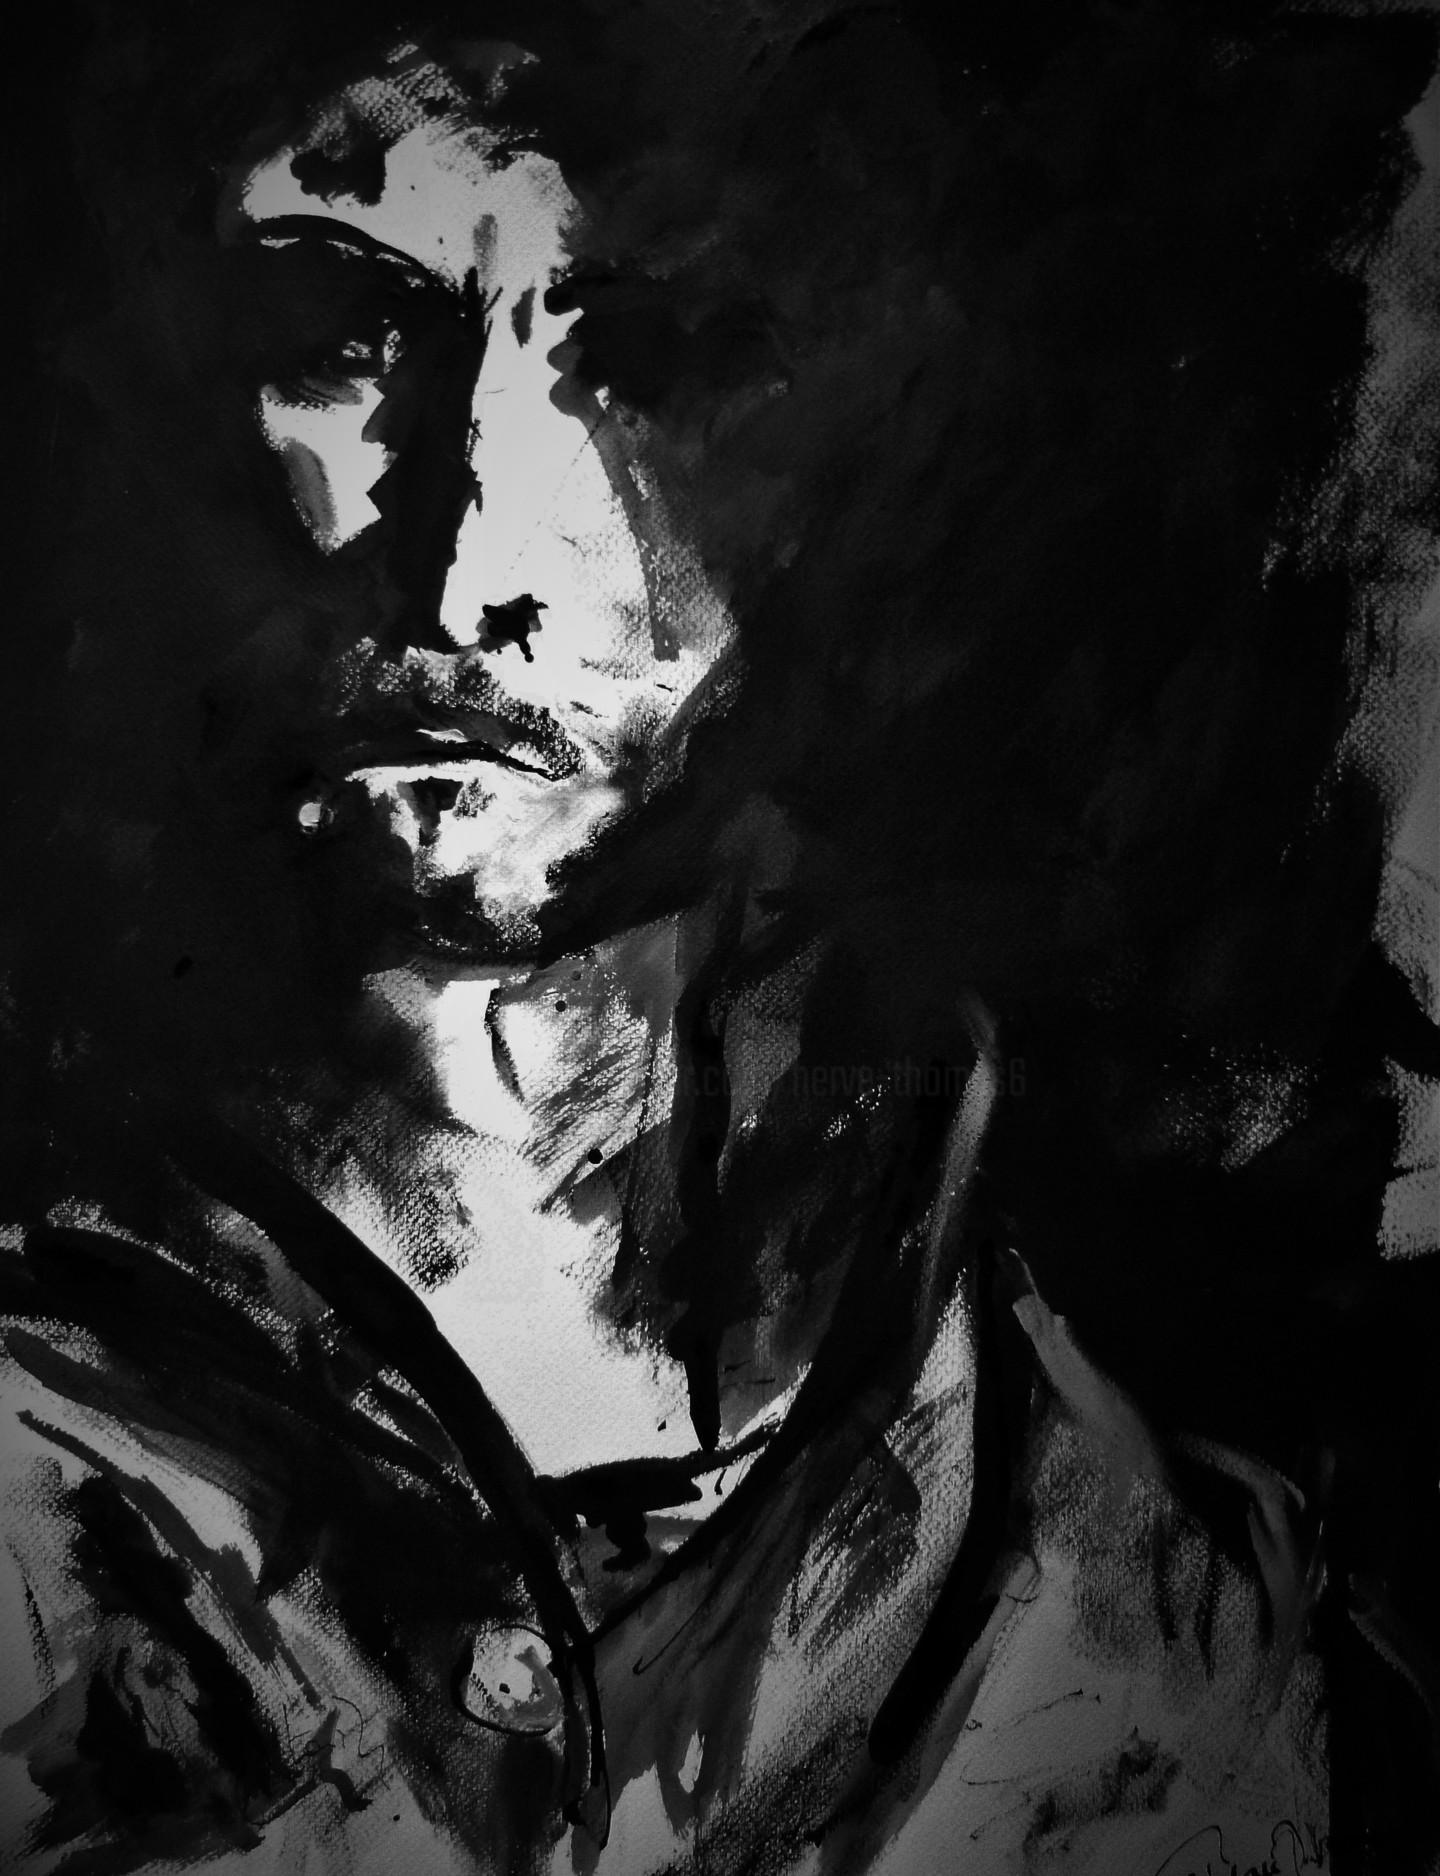 Herve Thomas-Miton - l'inconnu du web